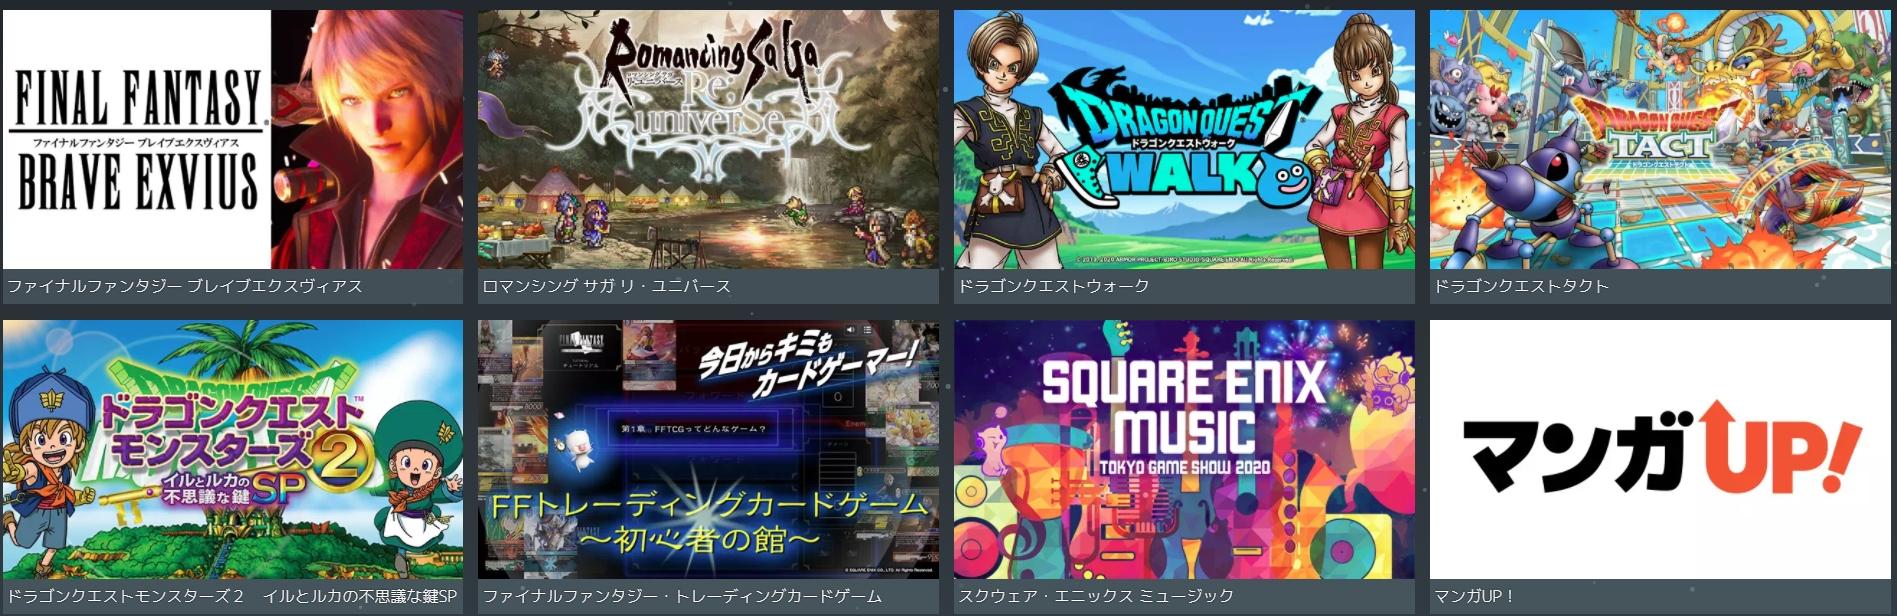 SE公开东京电玩展阵容:《巴比伦的陨落》确认出展